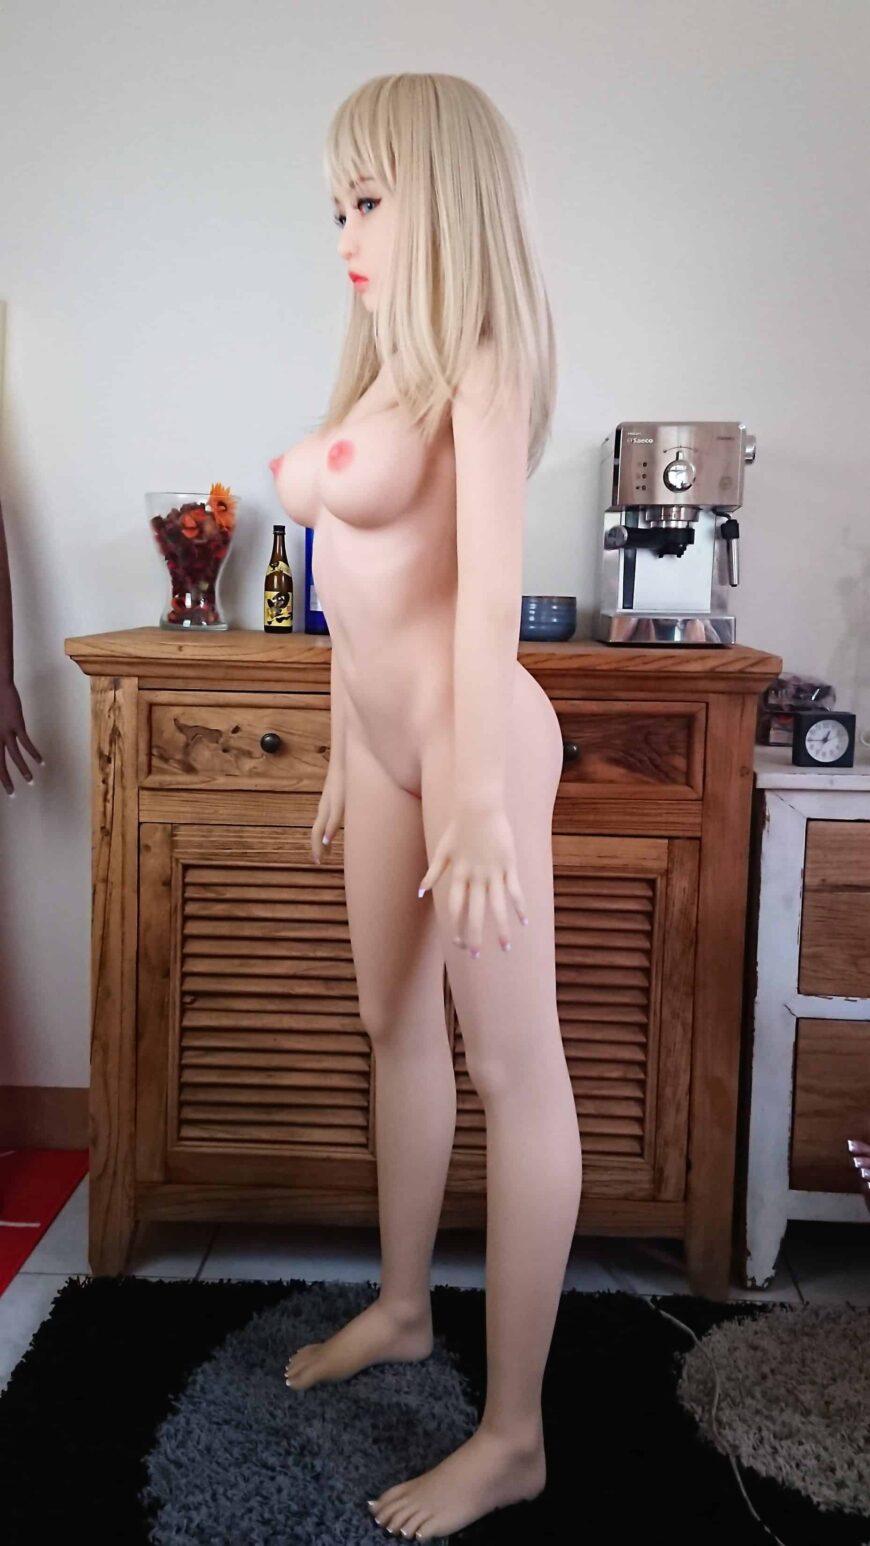 Sex-dolls-Molly-from-Dirty-Knights-sex-dolls-posing-in-bikini-1 (2)